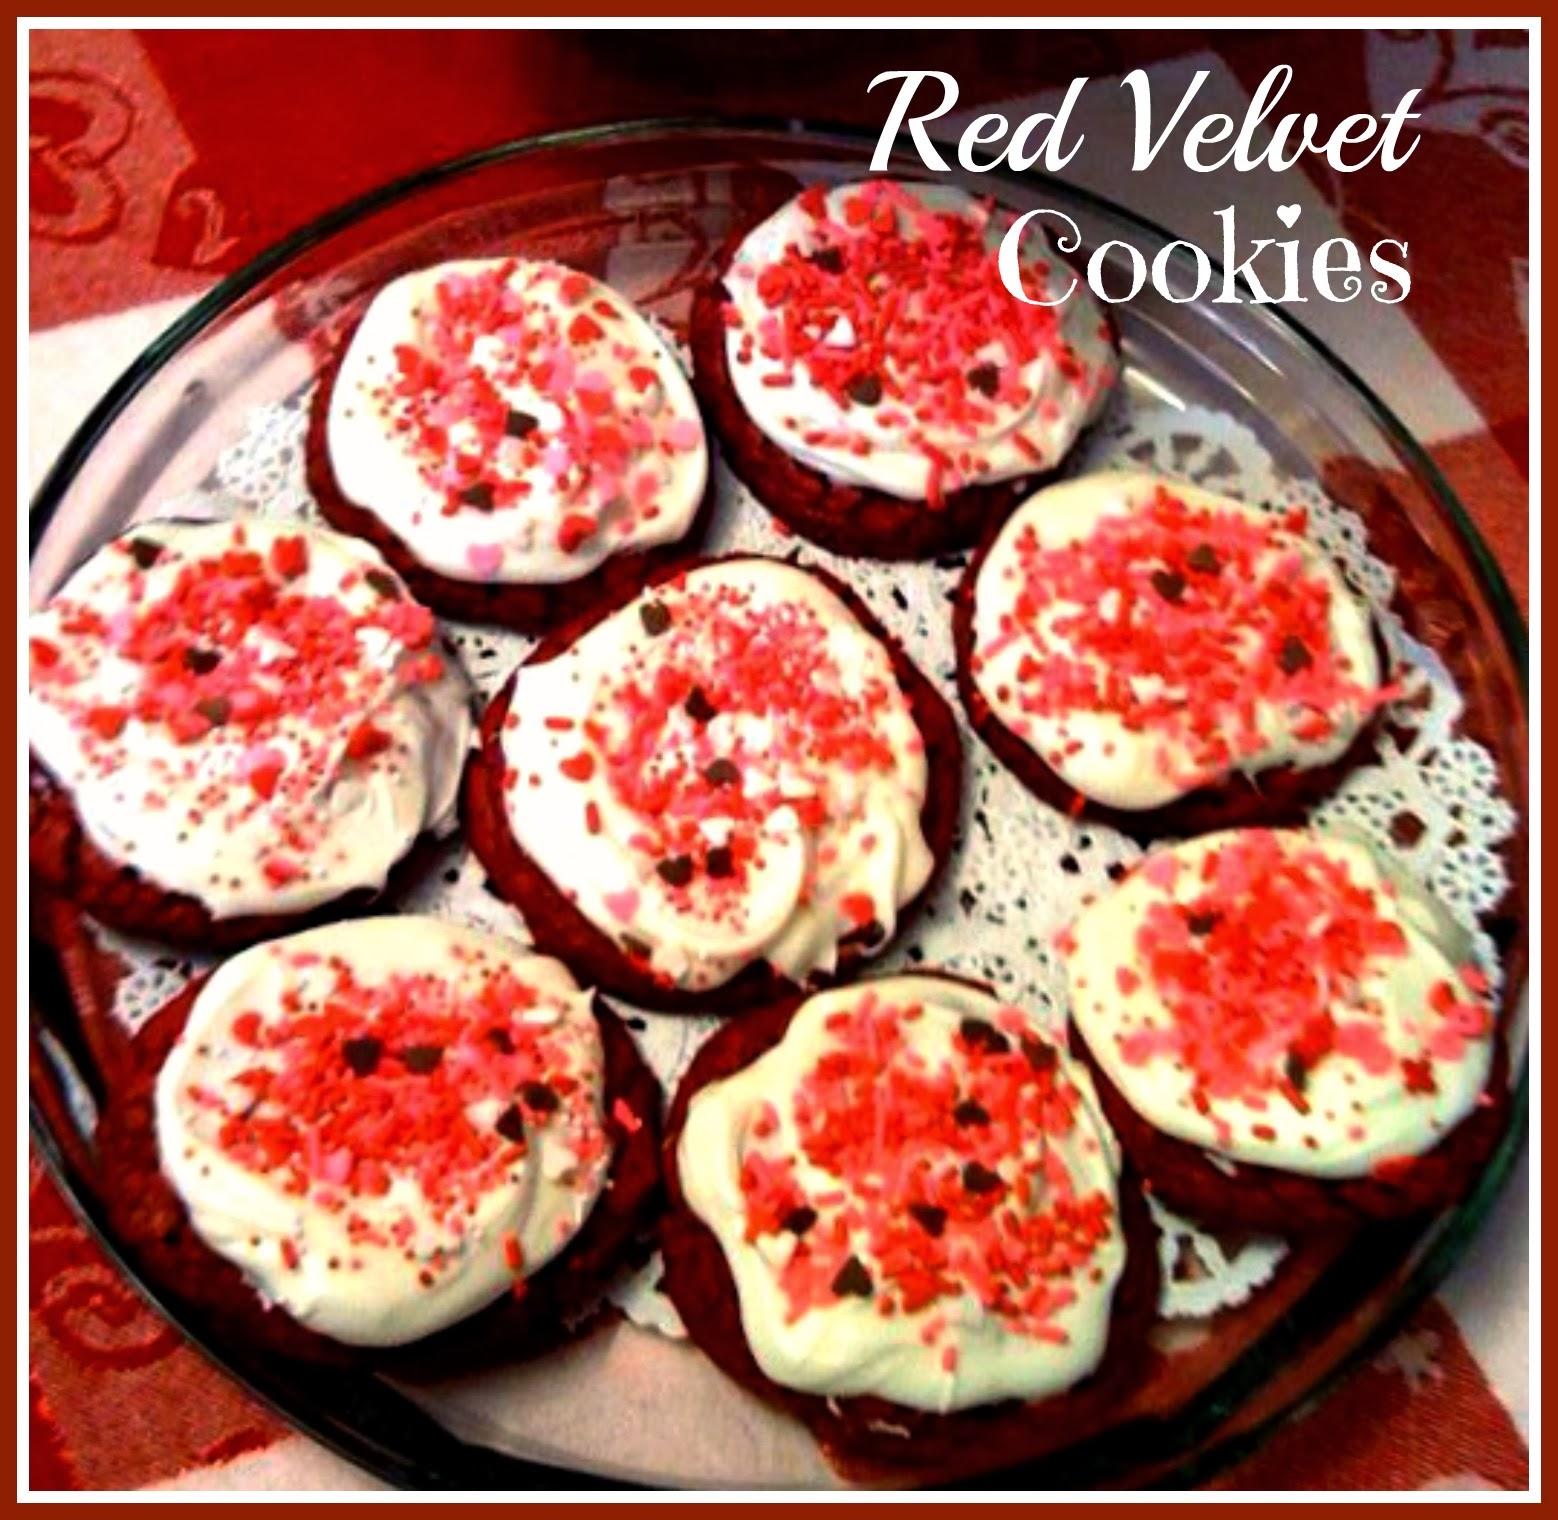 ... Cornbread: Easy Peasy Red Velvet Cookies with Cream Cheese Frosting